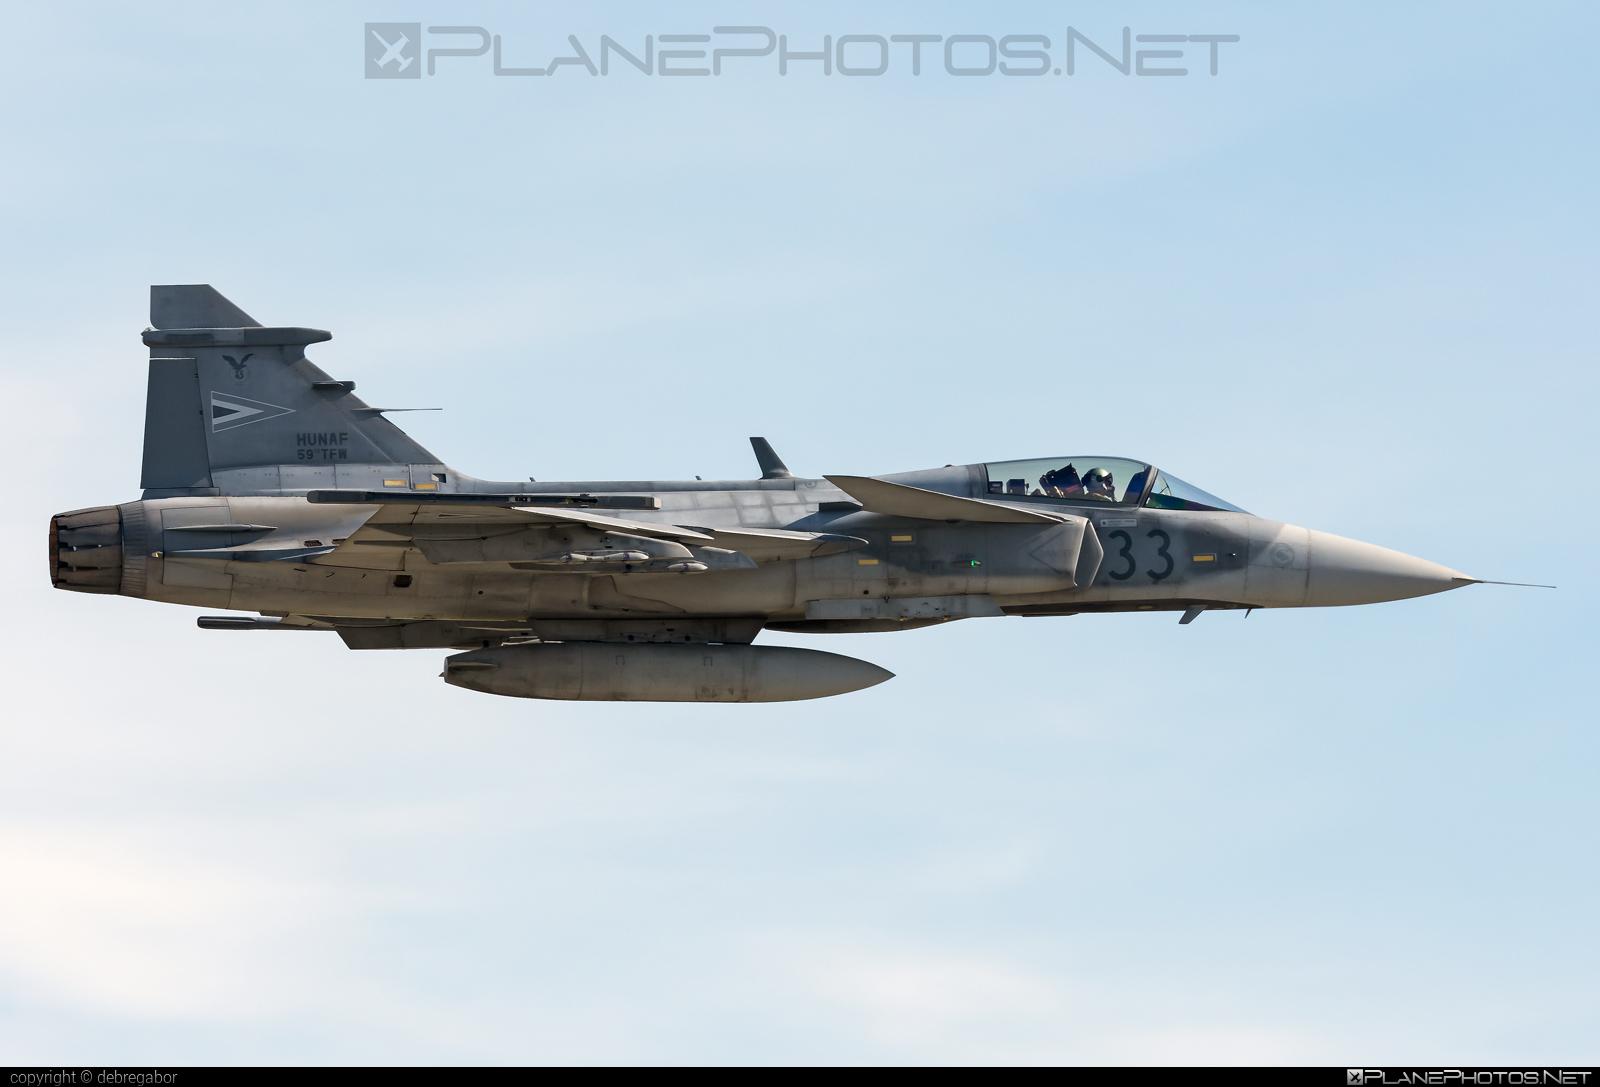 Saab JAS 39C Gripen - 33 operated by Magyar Légierő (Hungarian Air Force) #gripen #hungarianairforce #jas39 #jas39c #jas39gripen #kecskemetairshow2021 #magyarlegiero #saab